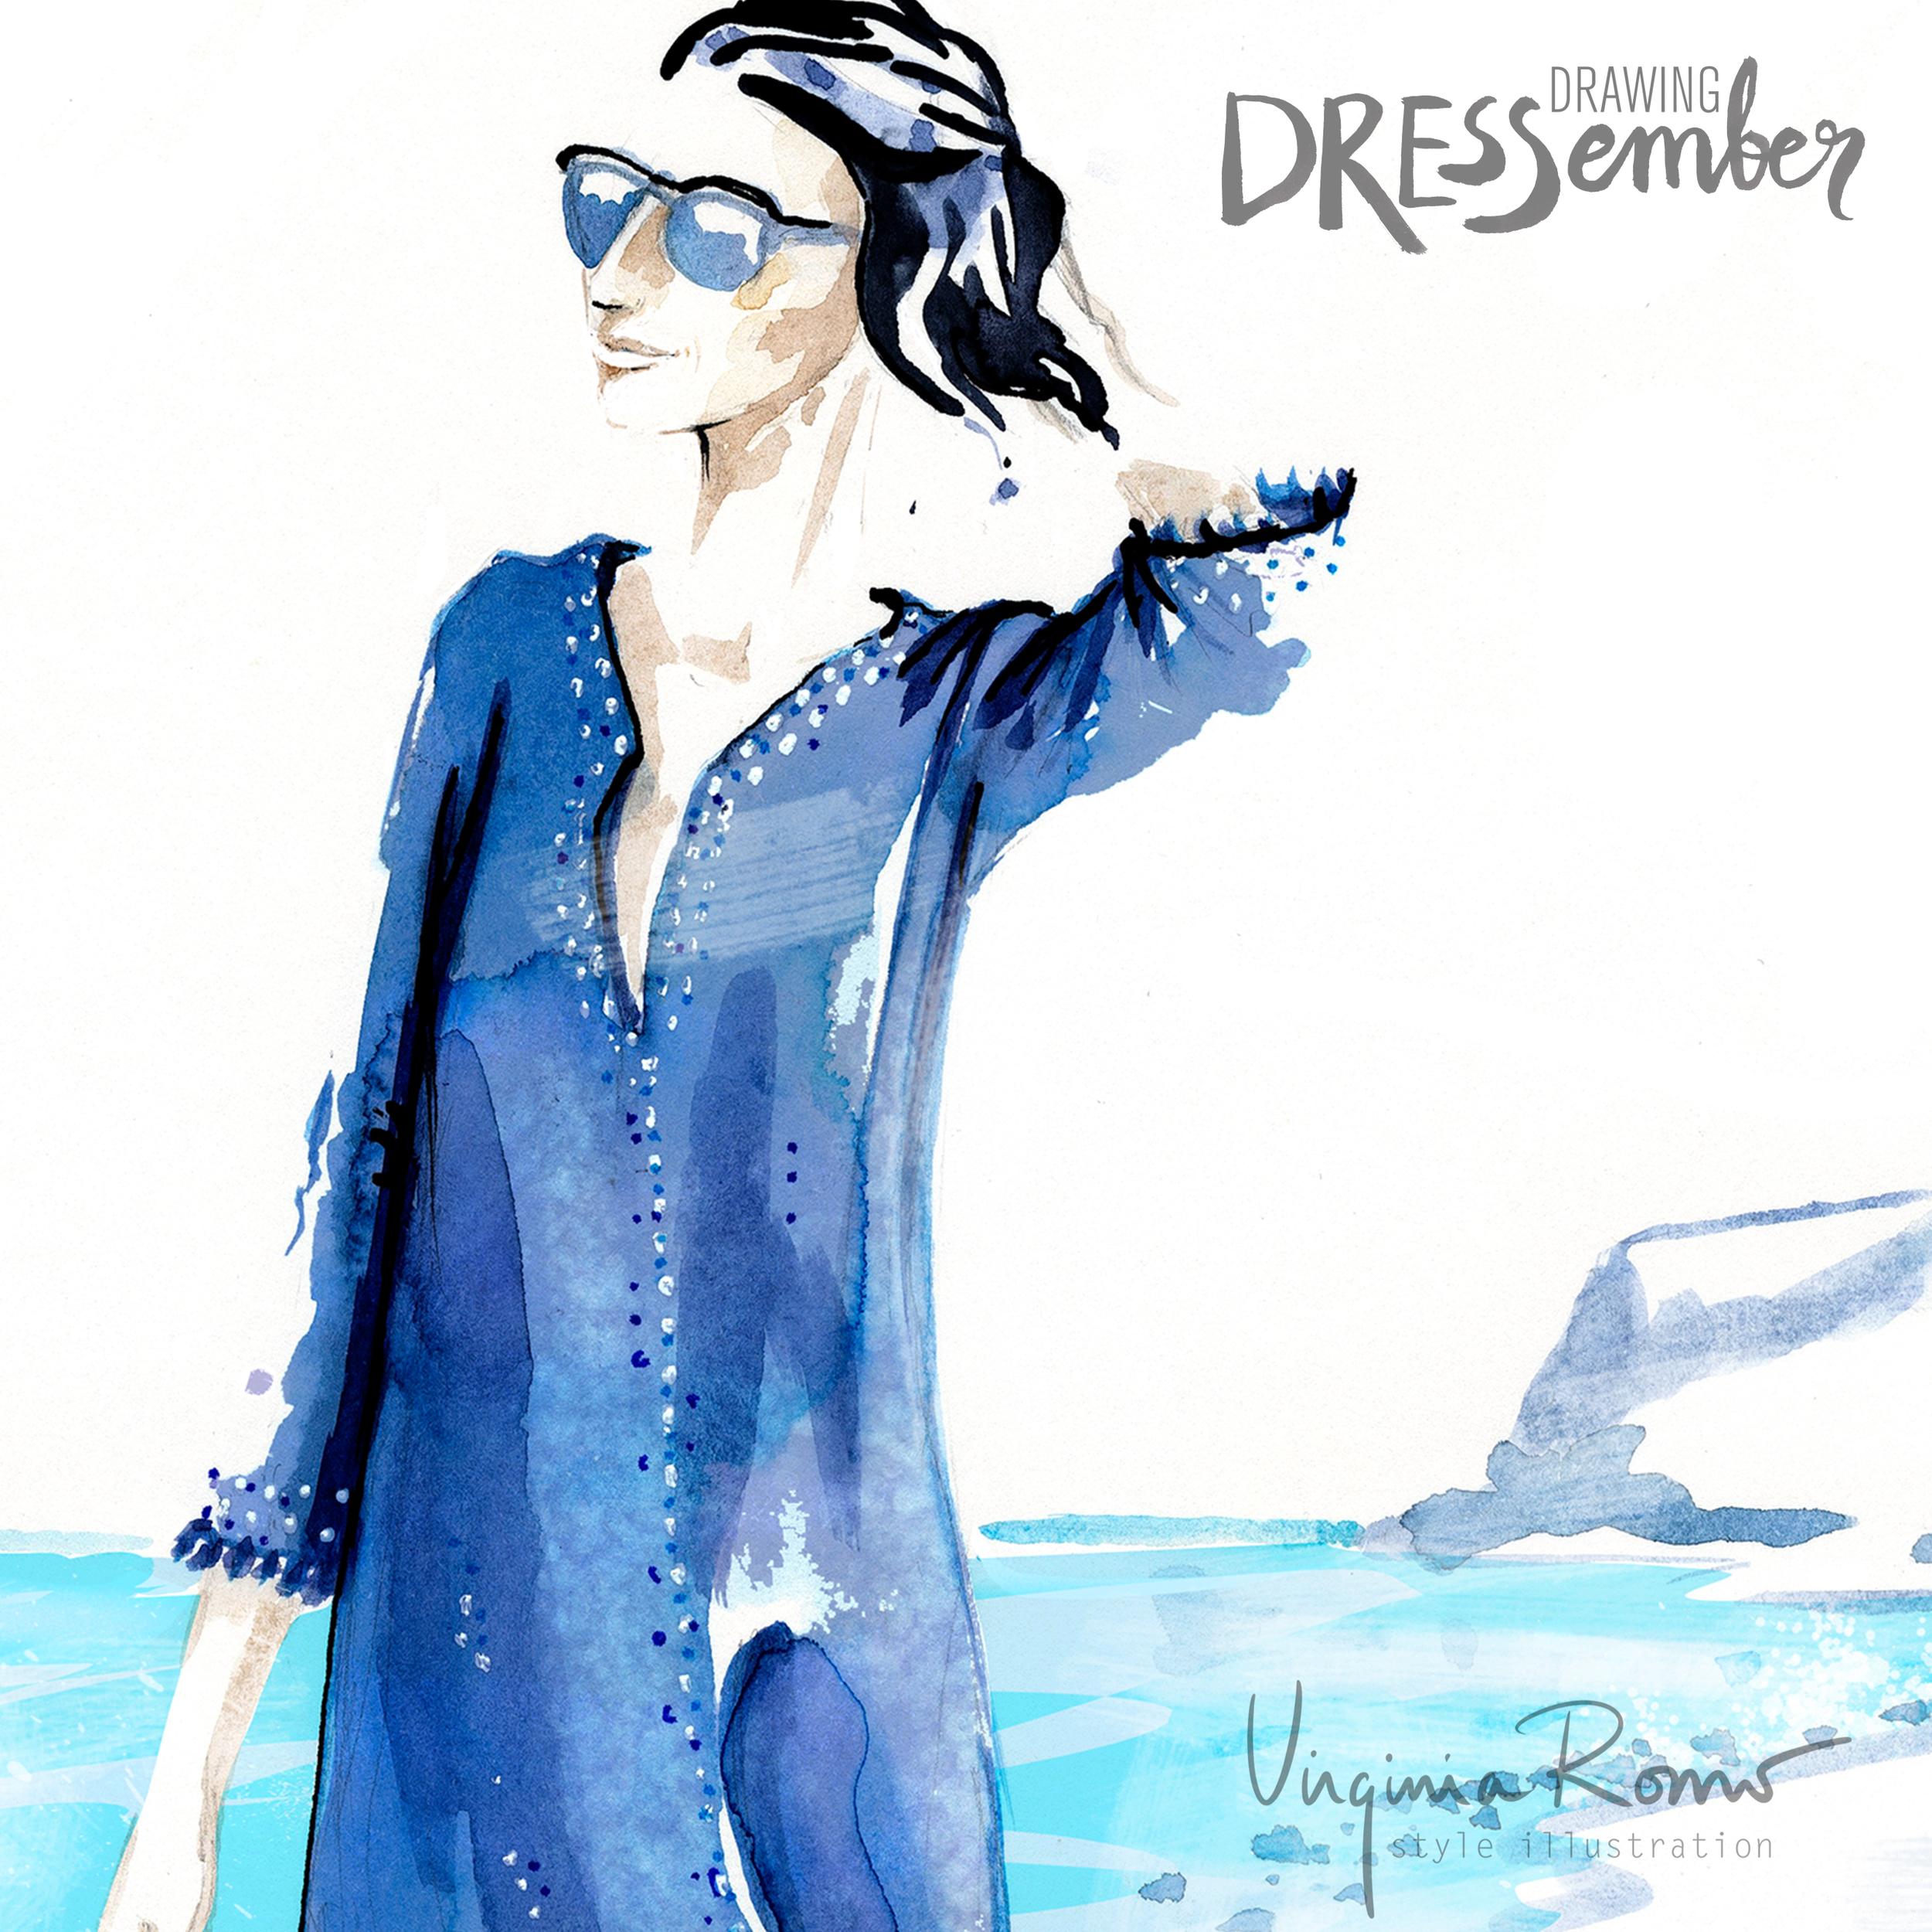 dressember-VirginiaRomoIllustration-14-Sanja-IG-BIG.jpg